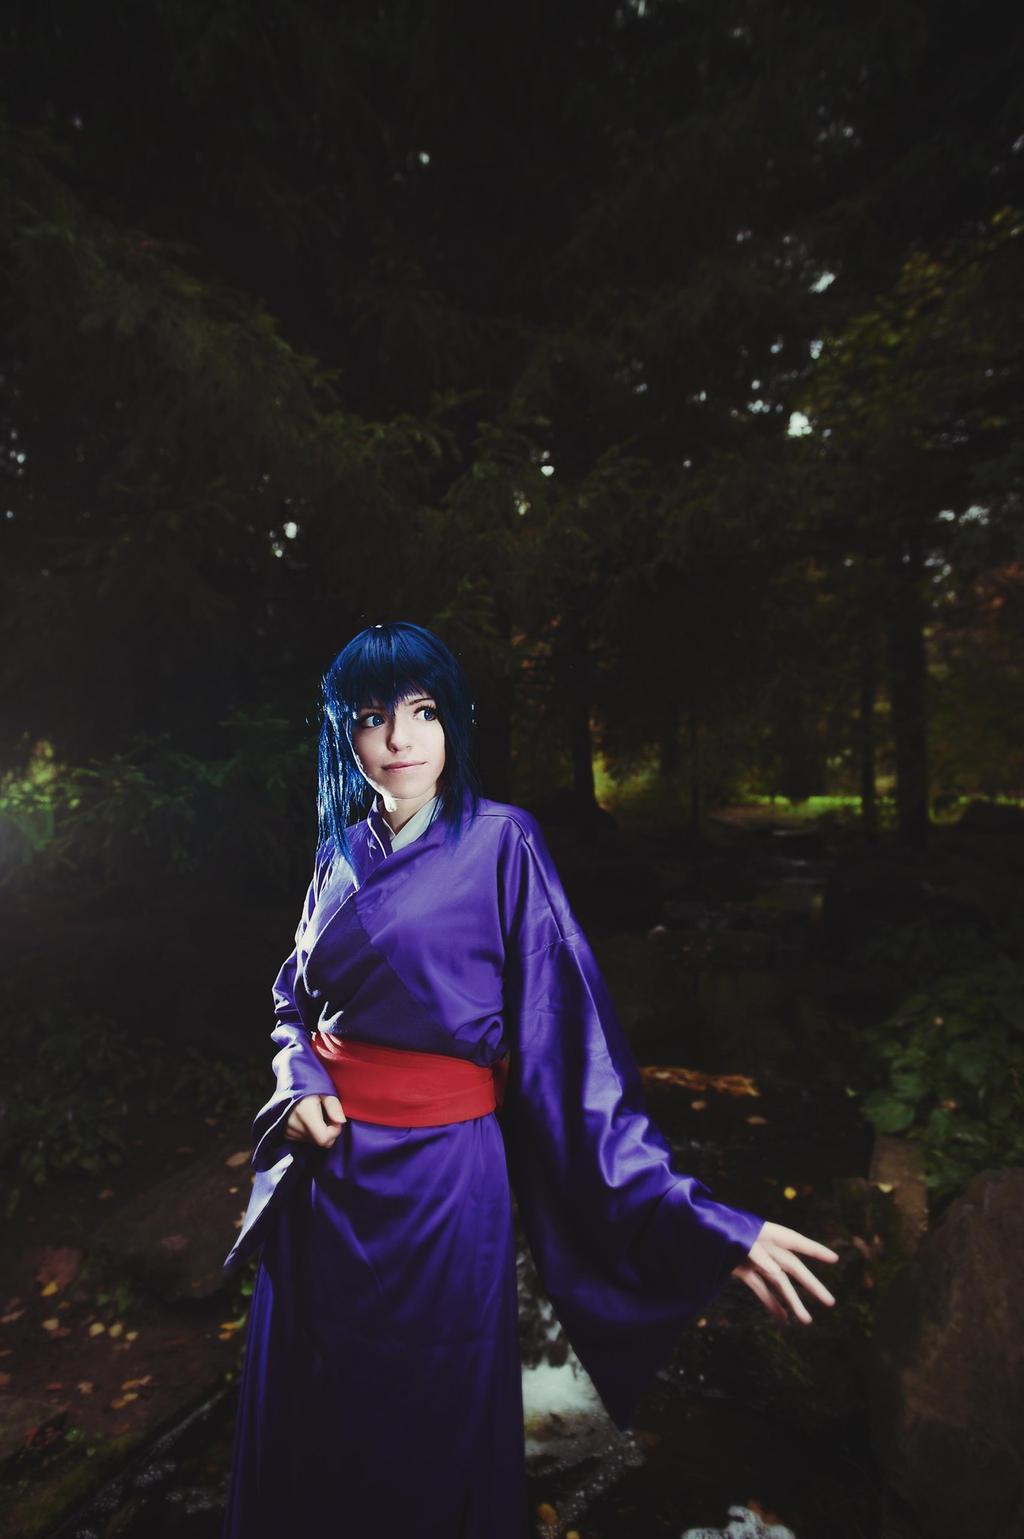 Oboro  - Basilisk The Kouga Ninja Scroll by TophWei